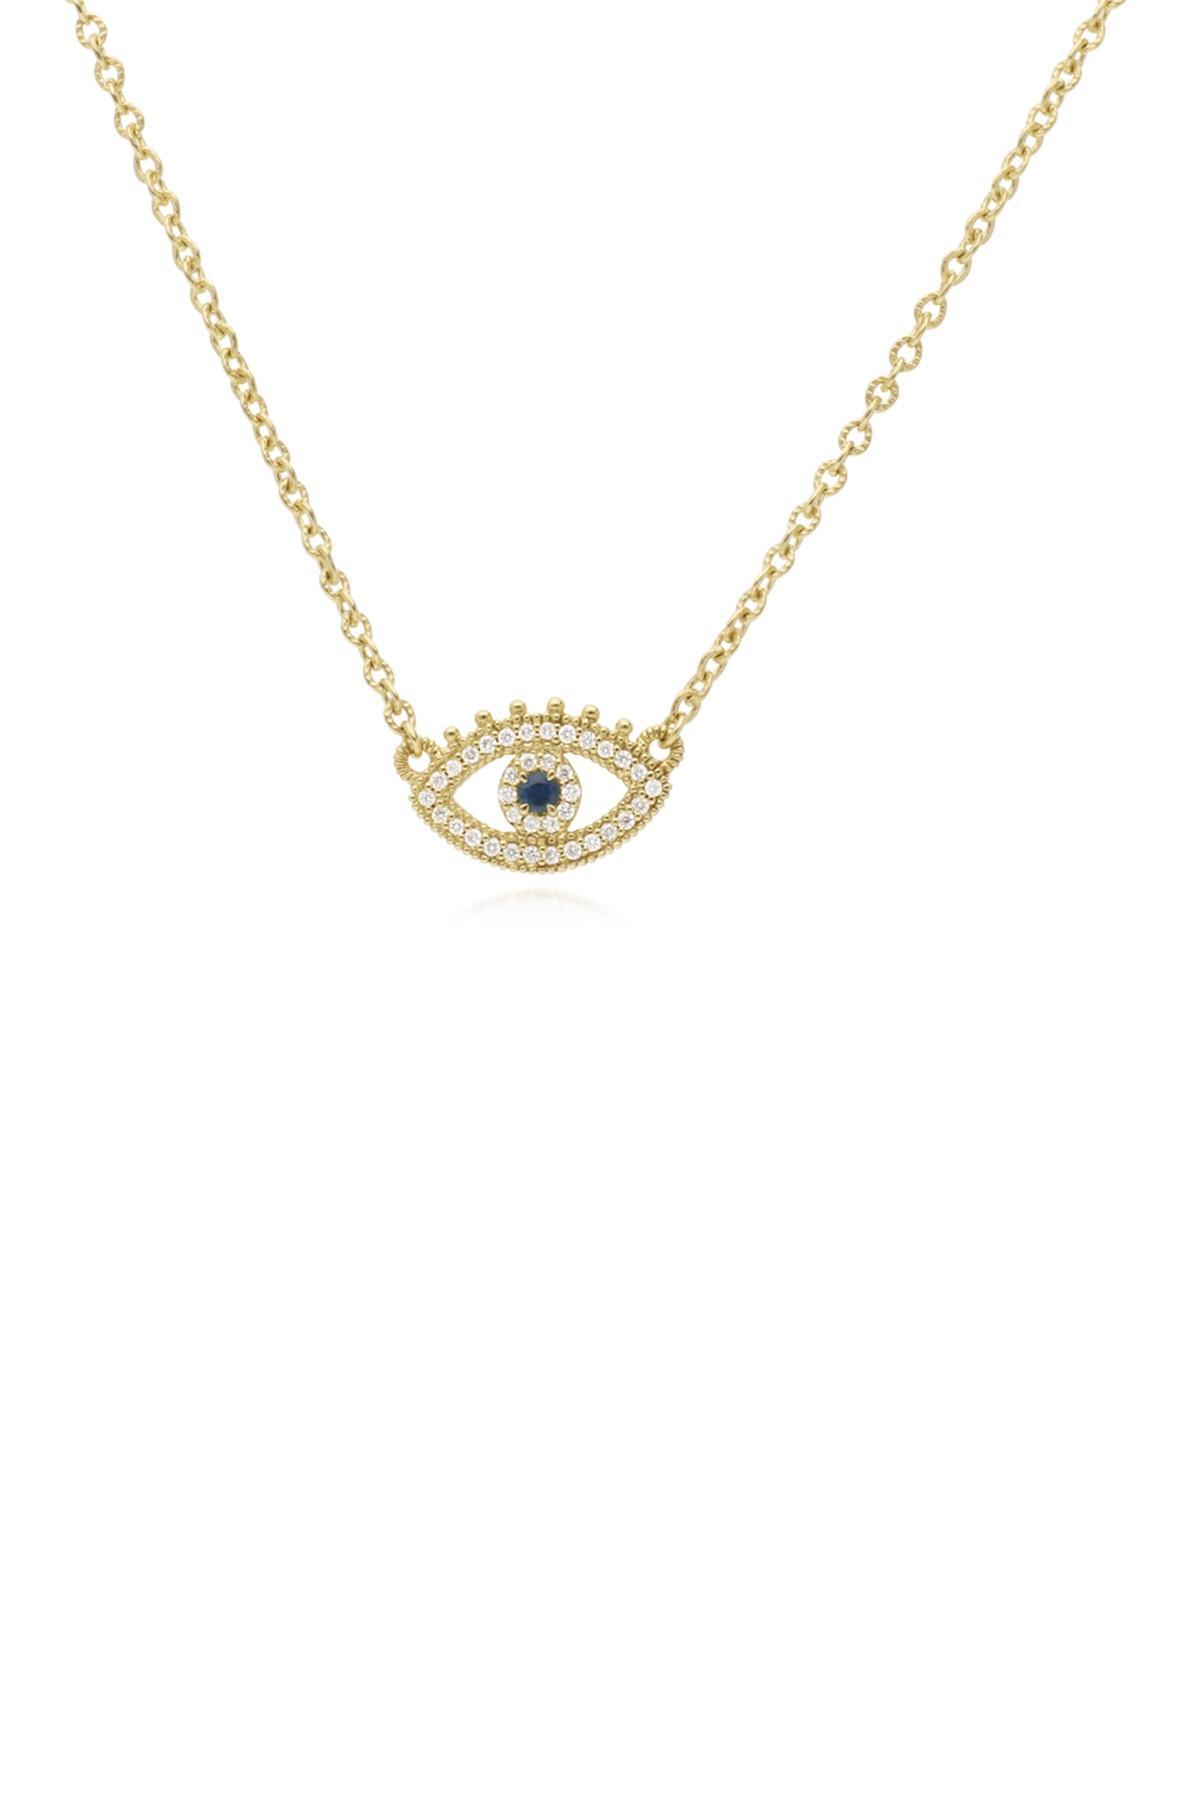 173662114f1cd Judith Ripka Juliette 14k Yellow Gold Pave Diamond & Blue Sapphire ...